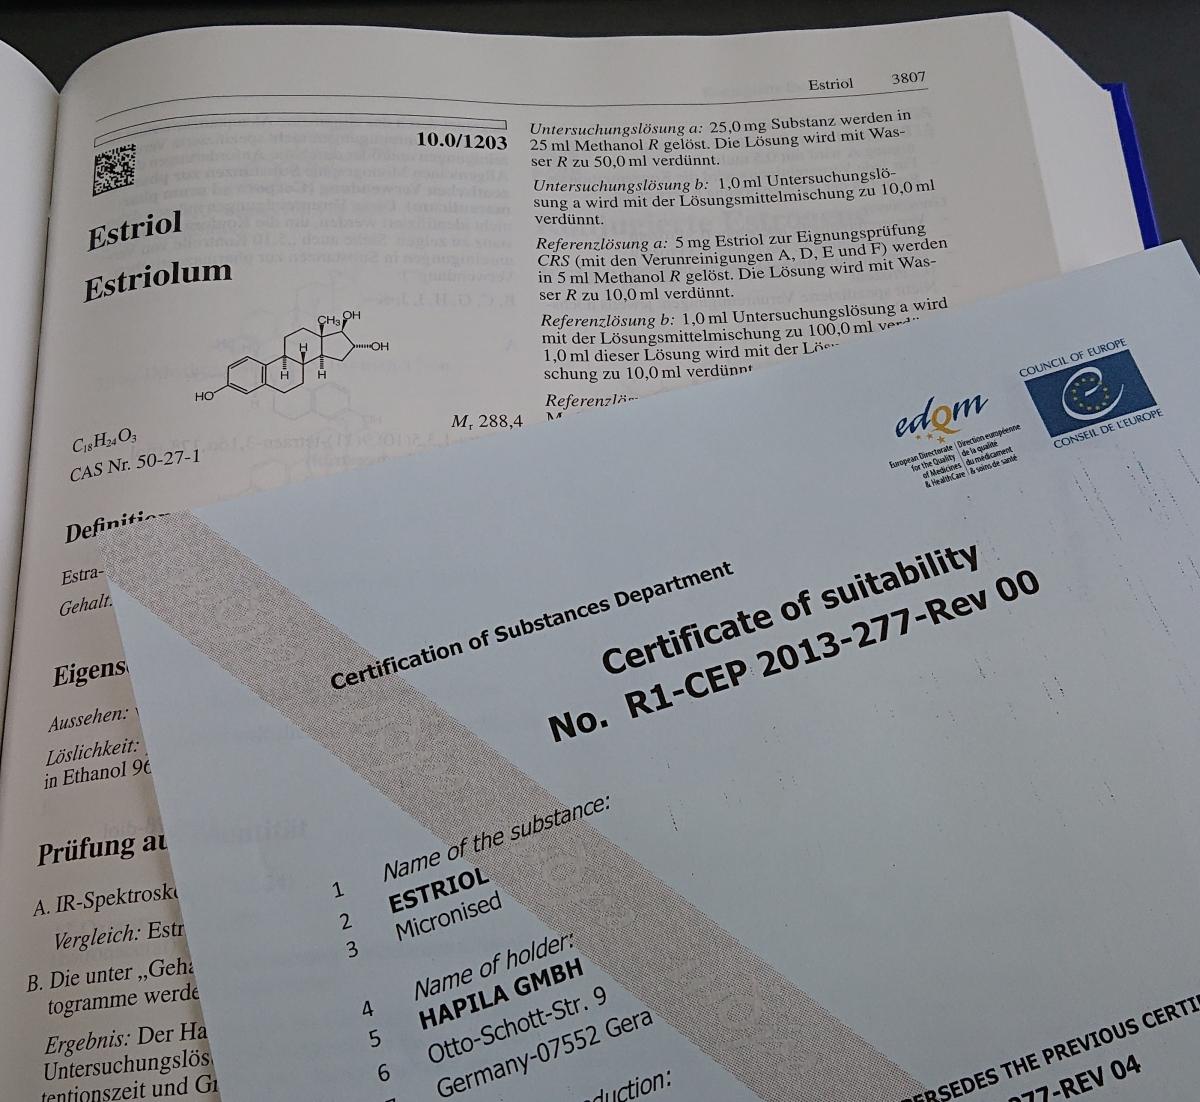 Authorities extend CEP certification for HAPILA's Estriol estrogen API